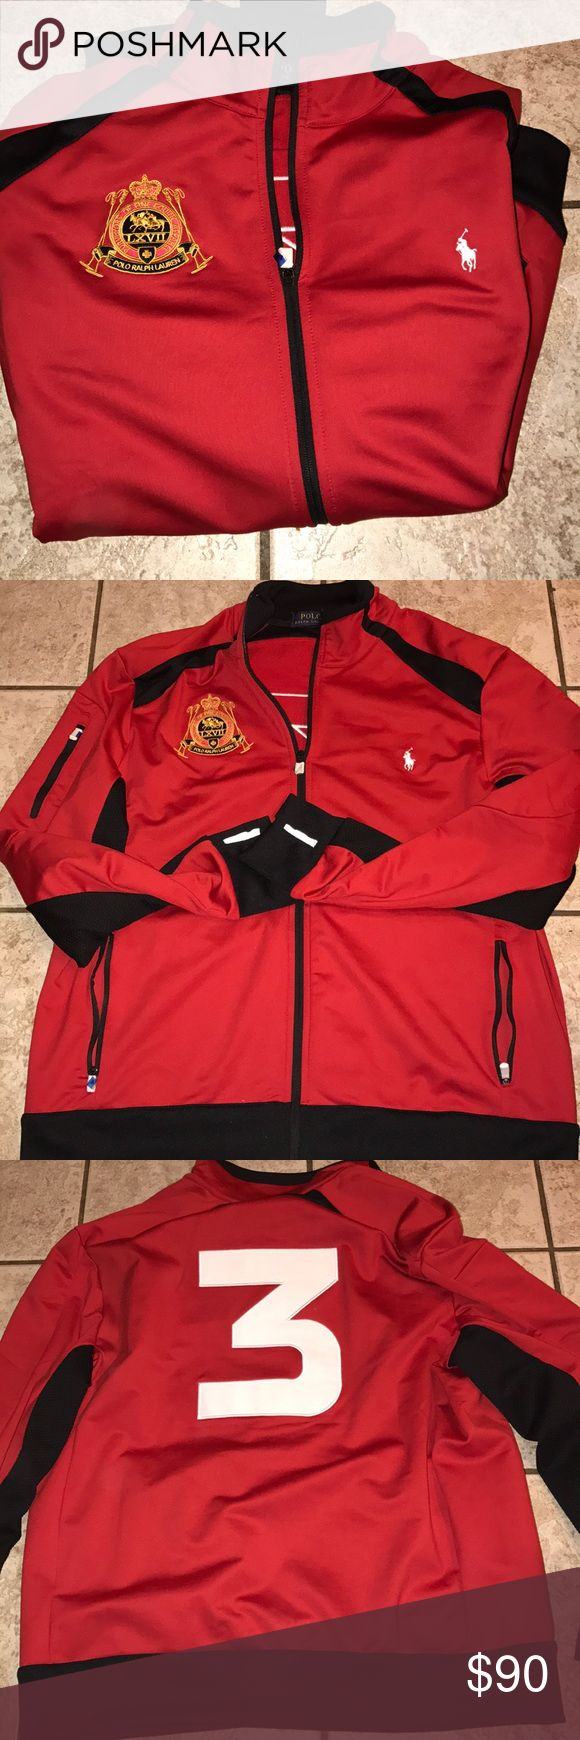 Polo sports jacket Brand new Polo by Ralph Lauren Jackets & Coats Lightweight & Shirt Jackets